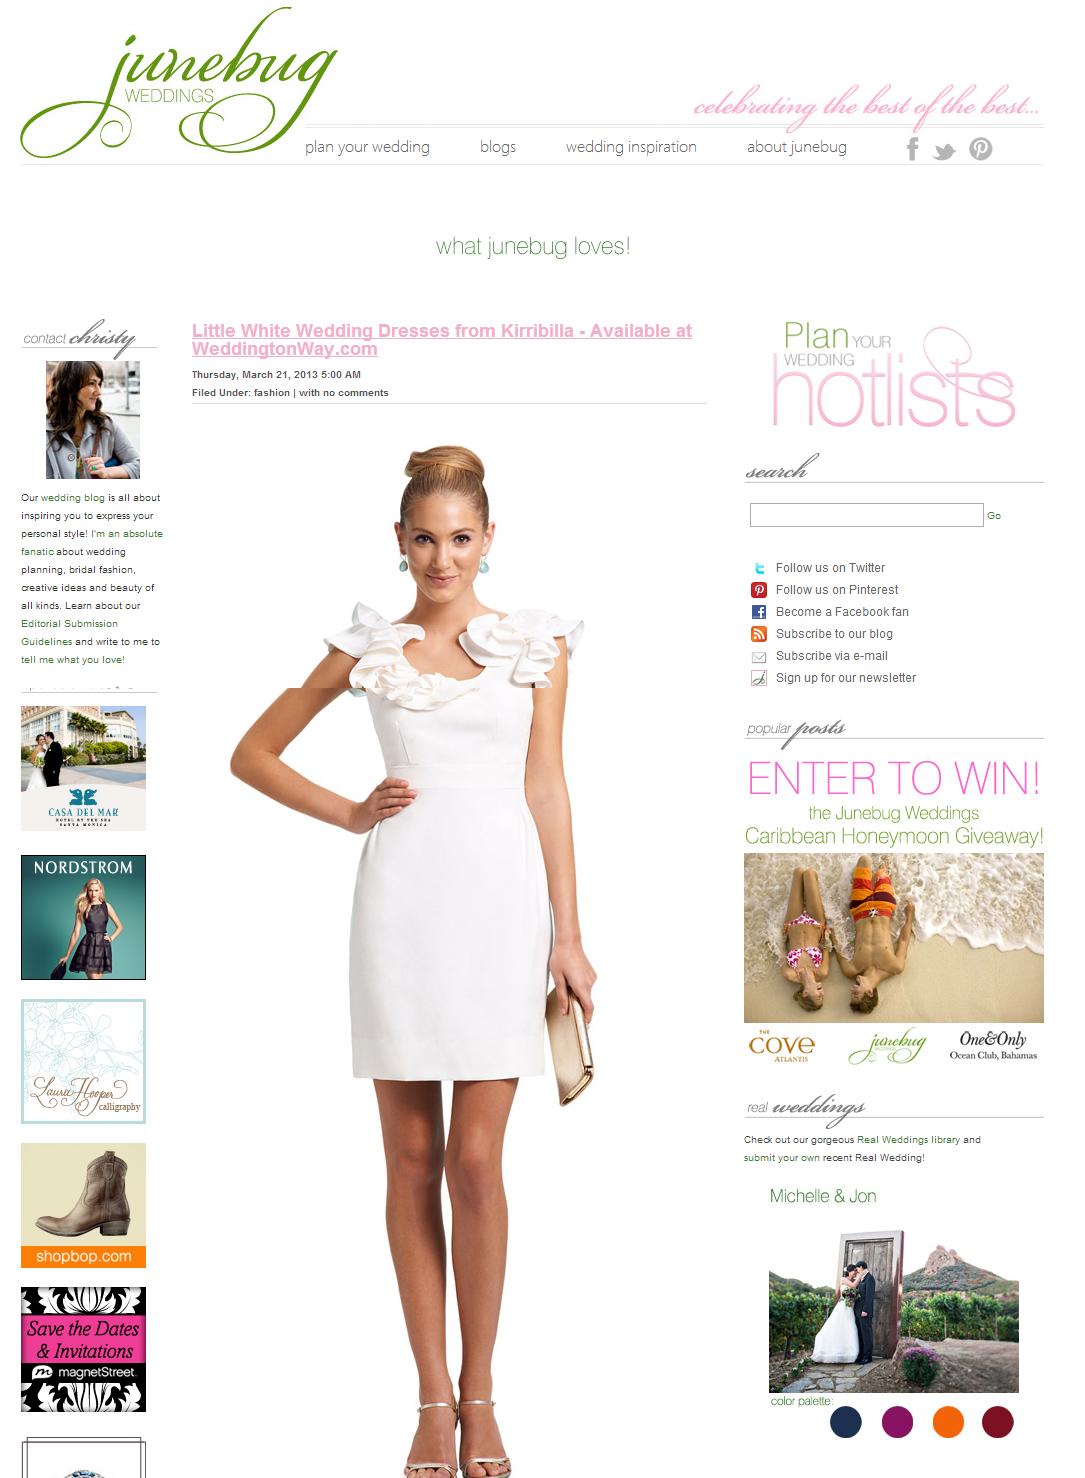 Junebug Weddings features Kirribilla's collection launch on Weddington Way. March 2013